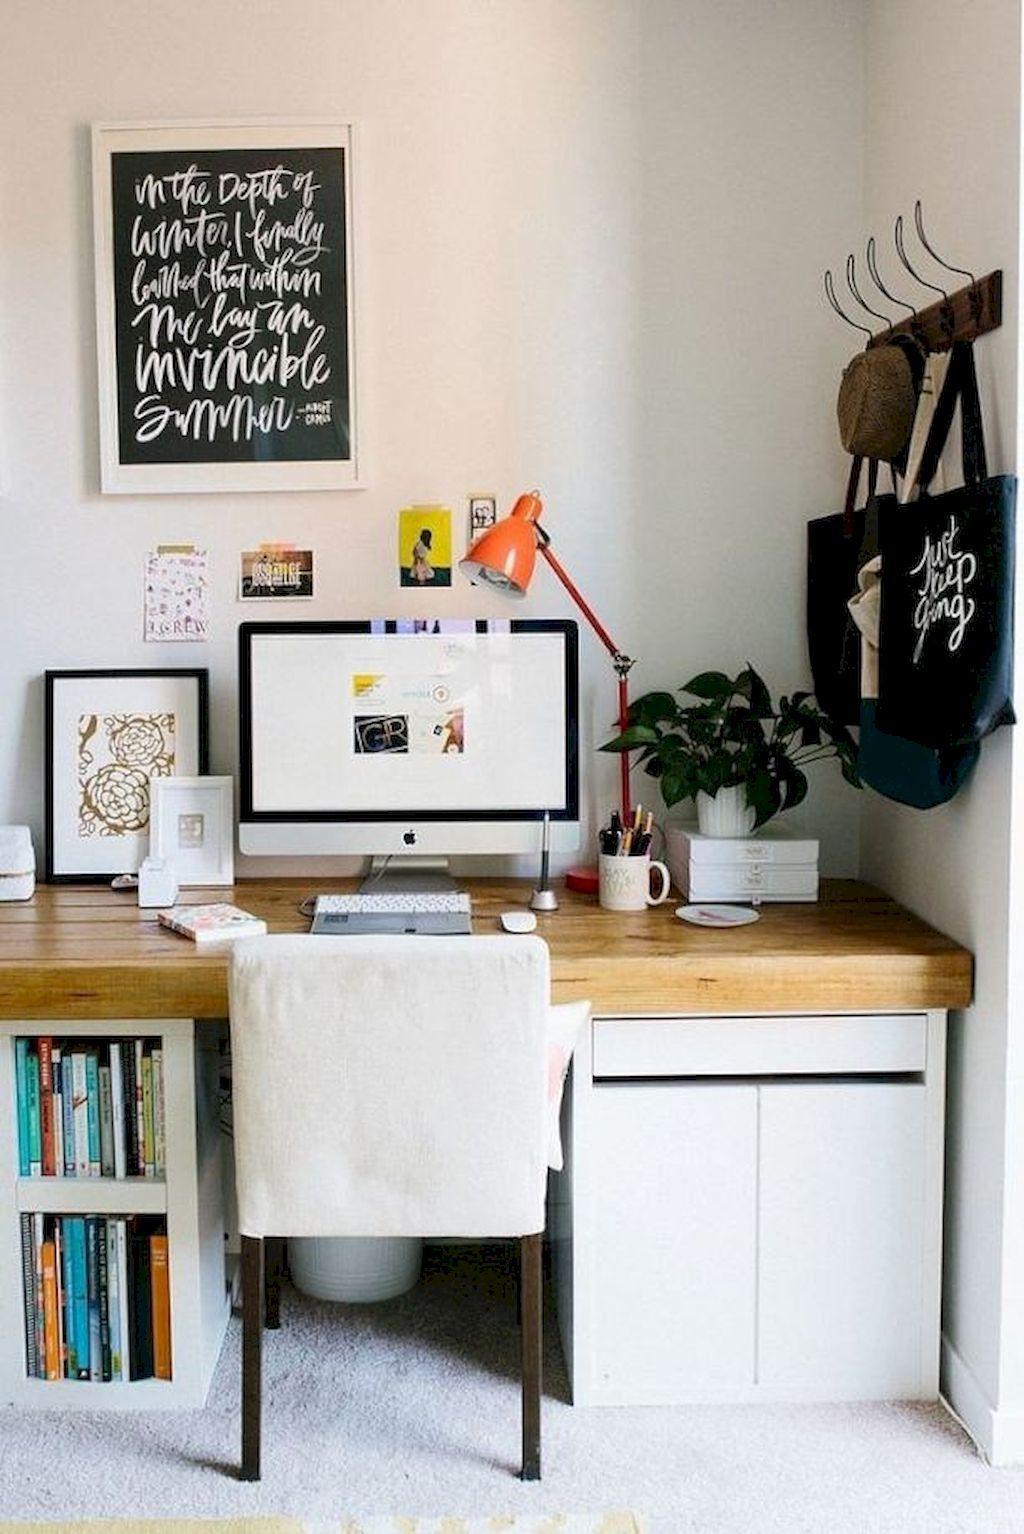 75 First Apartment Decor Ideas On A Budget